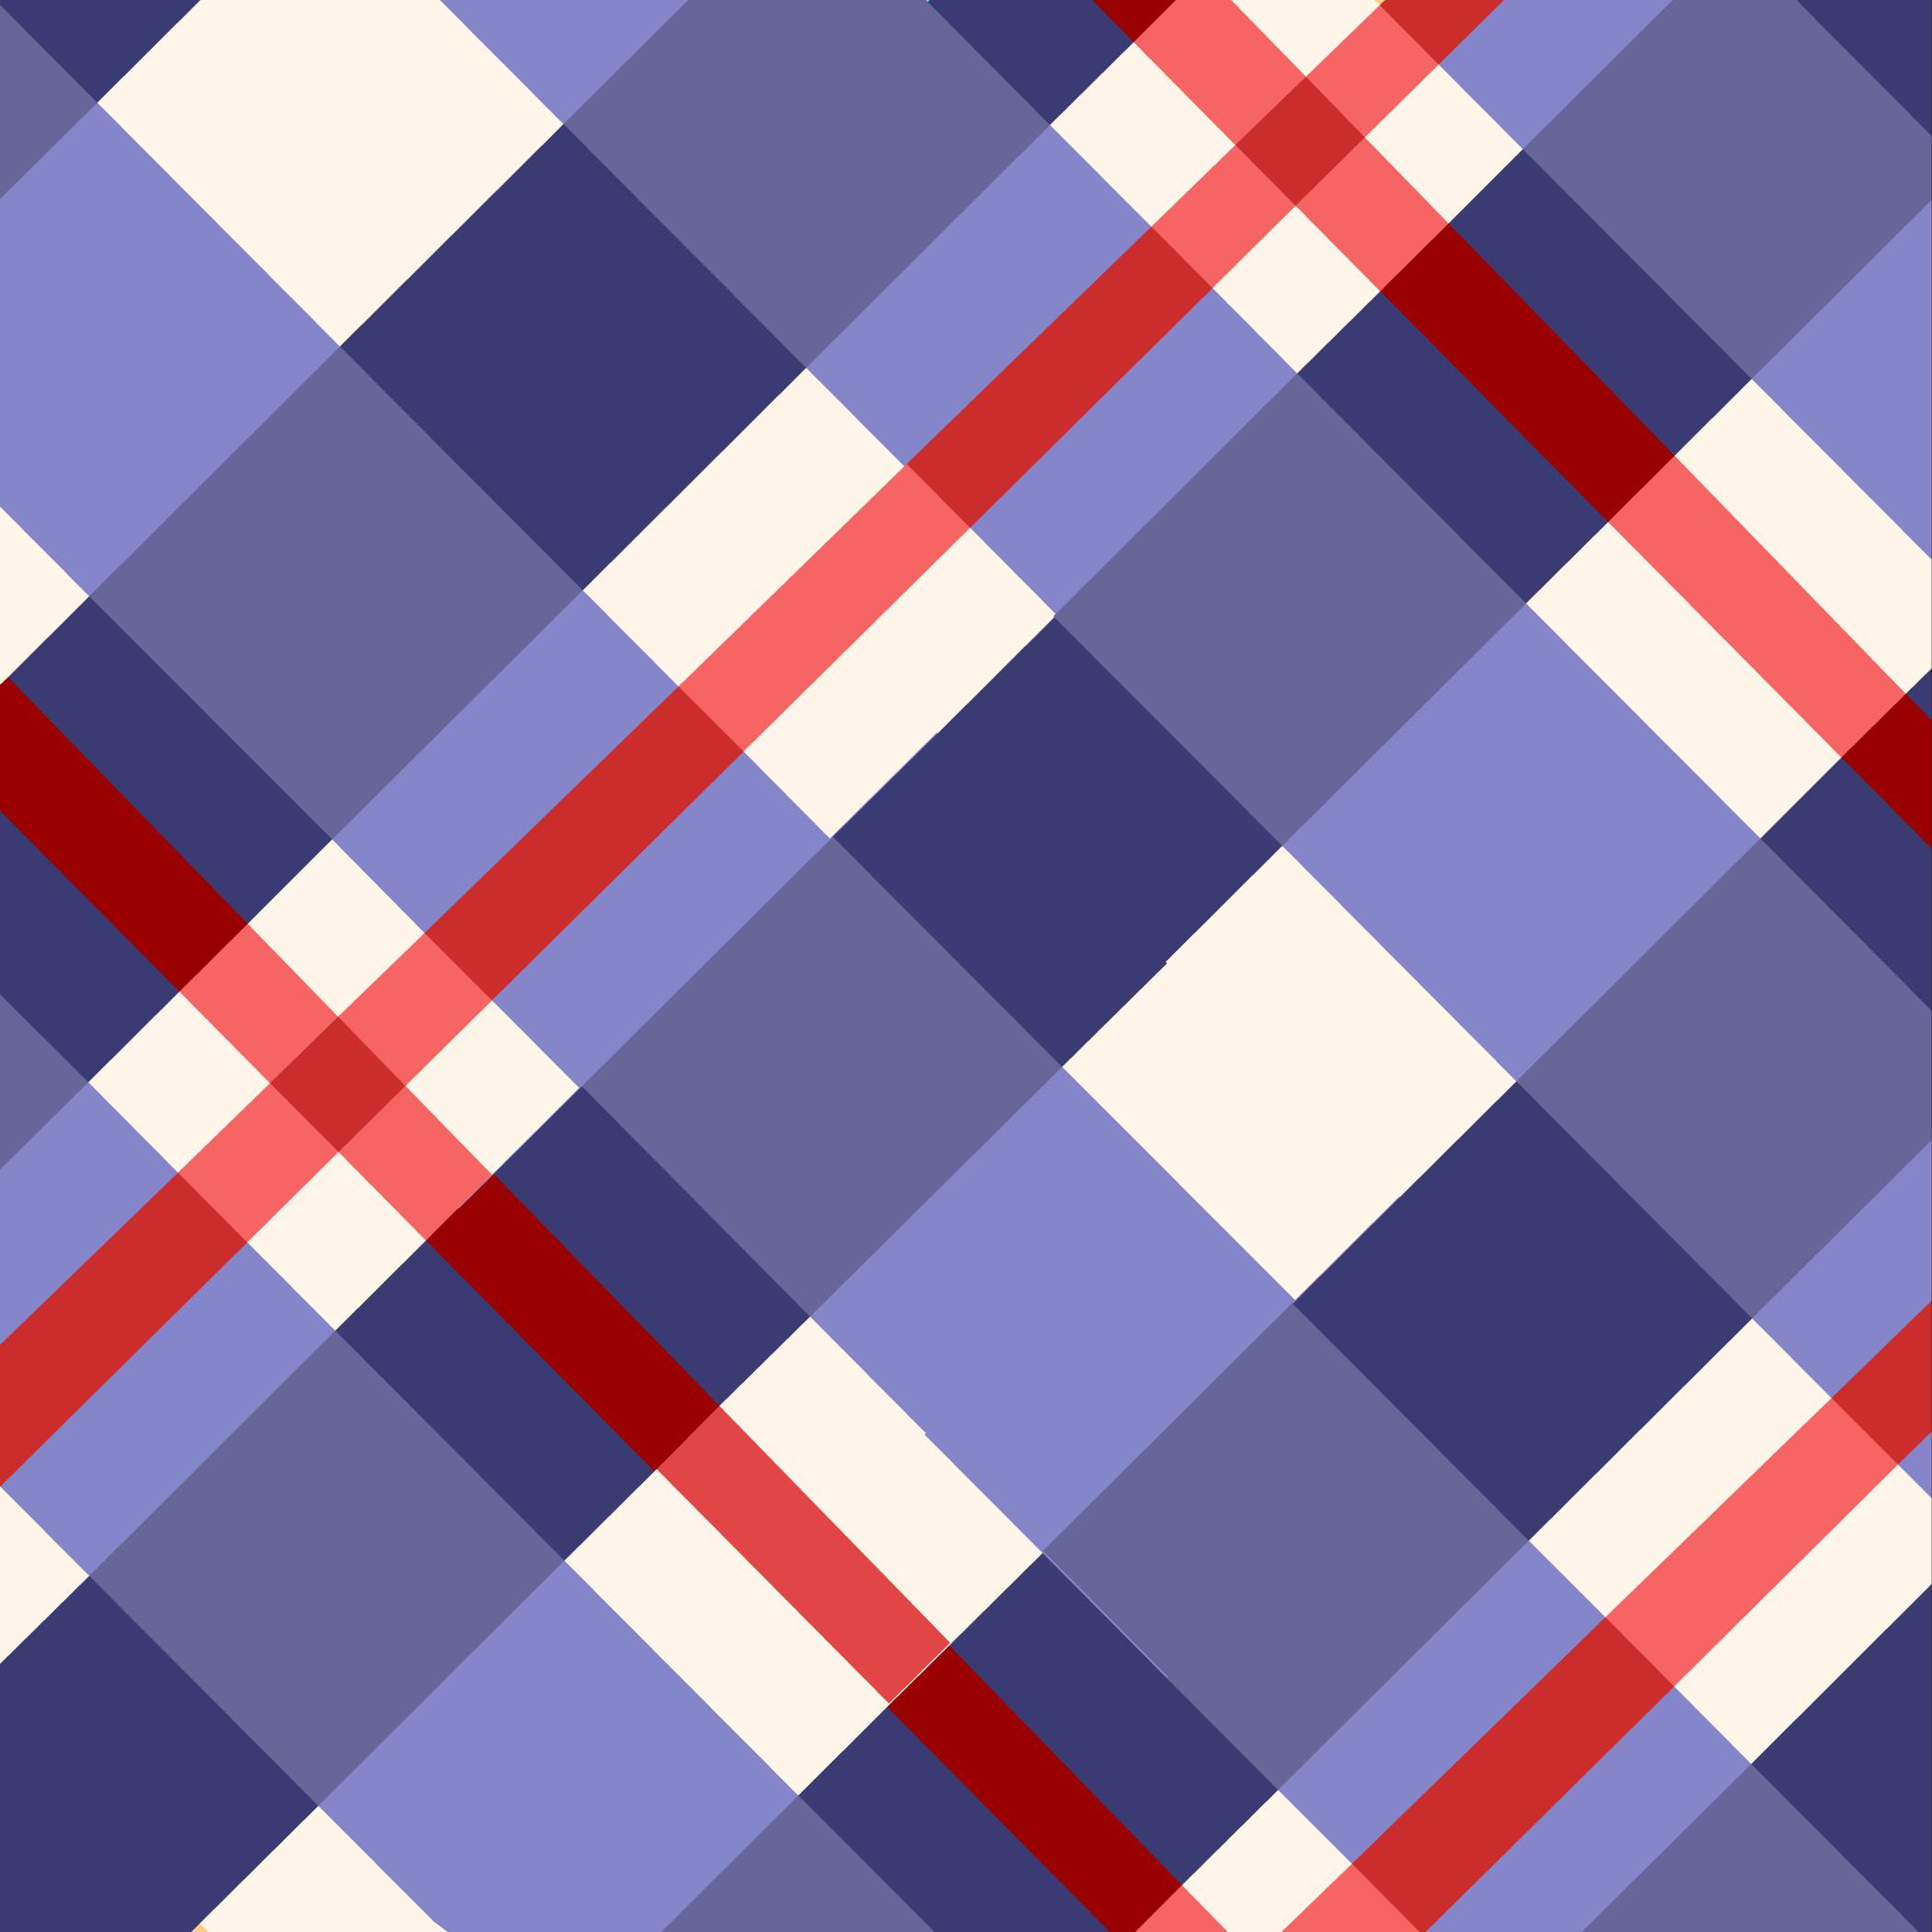 … blue 1920×1200 wallpaper; red and green plaid wallpaper wallpapersafari  …